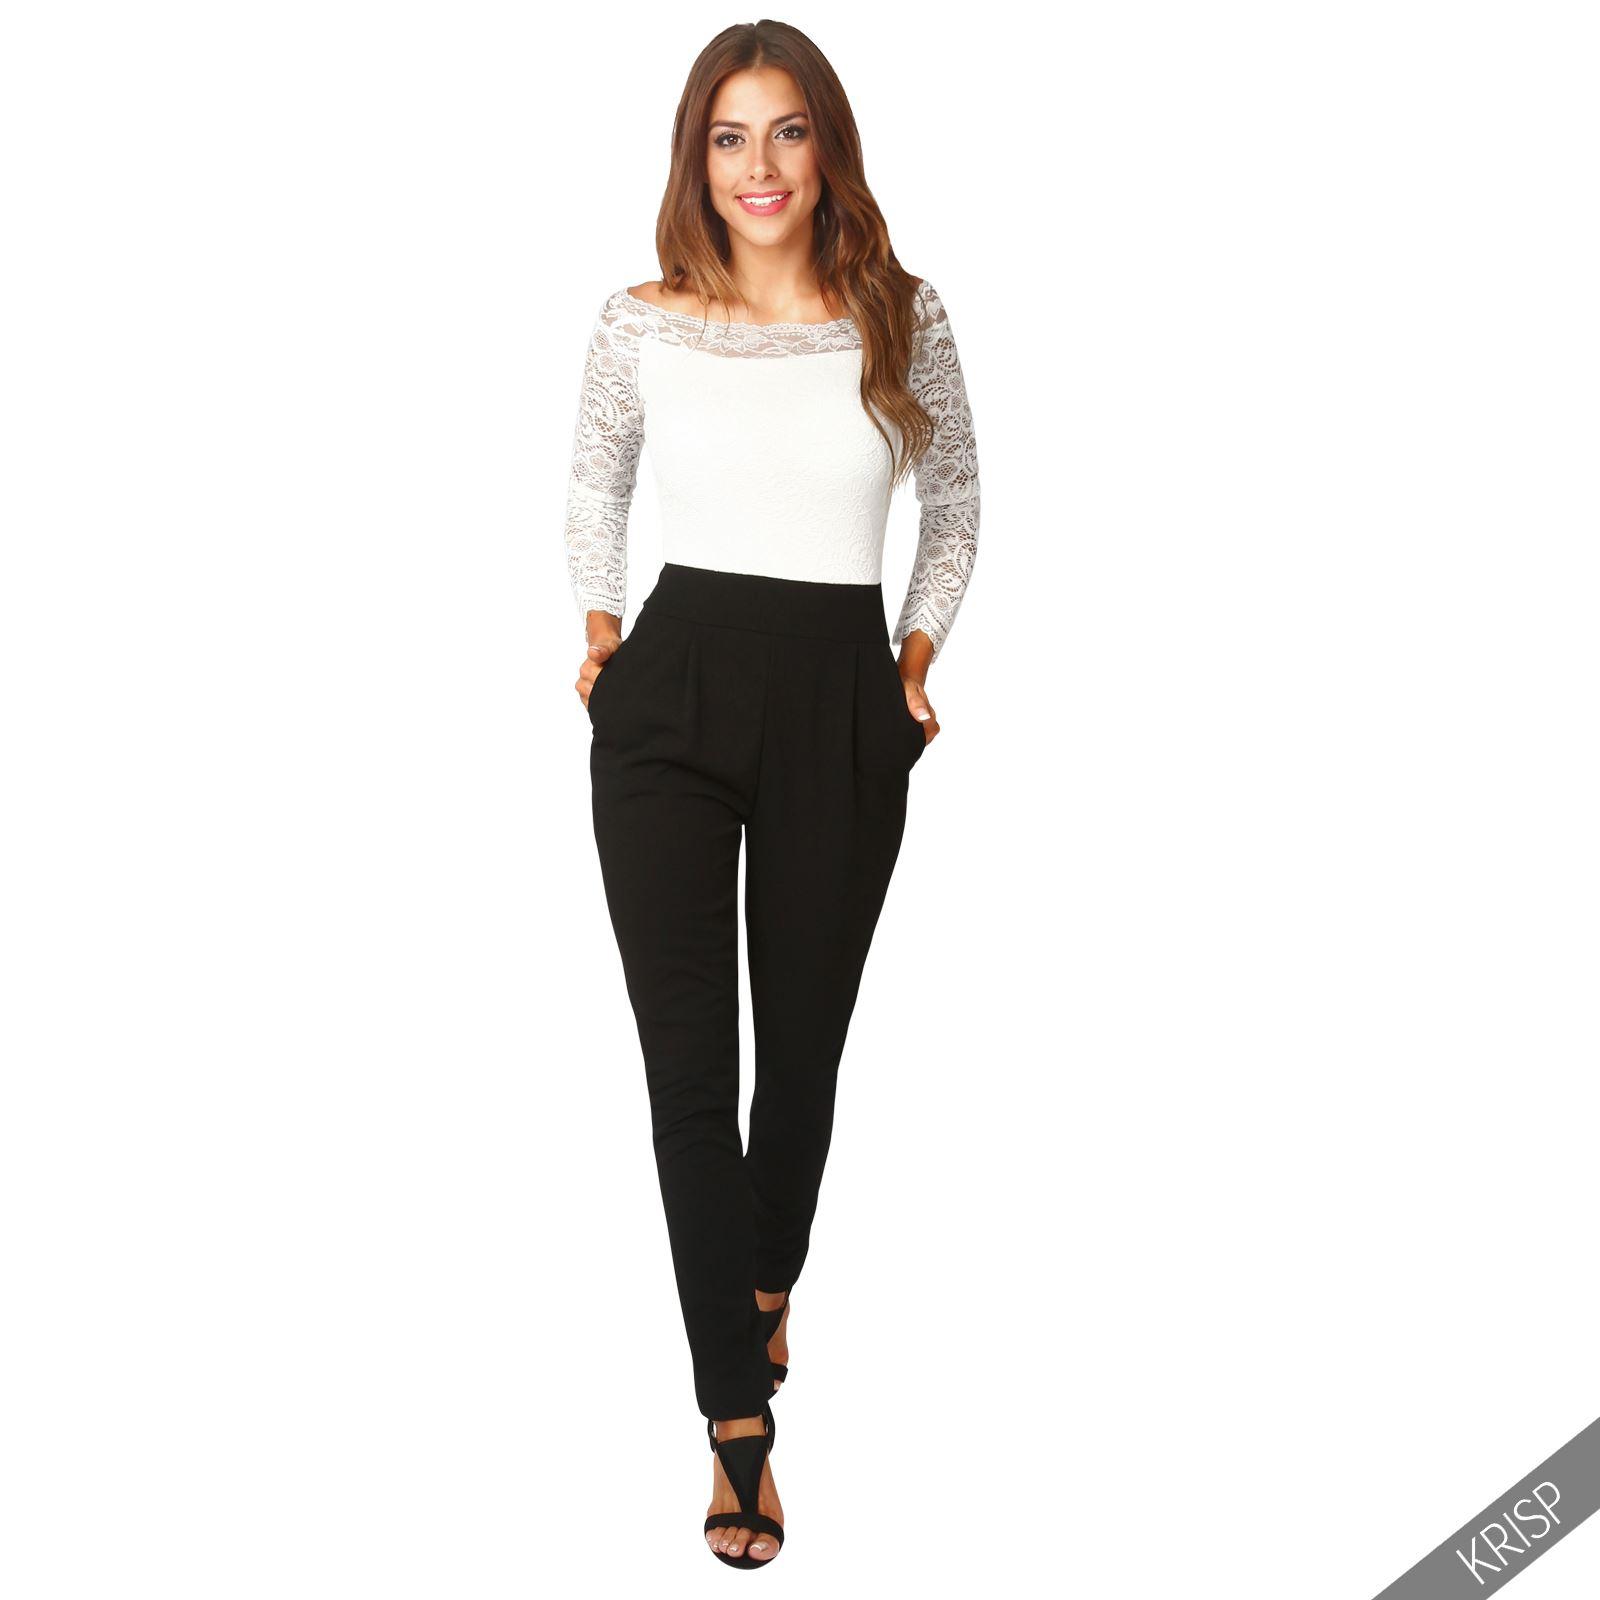 femmes combinaison pantalon top bardot haut dentelle crochet bodycon soir e ebay. Black Bedroom Furniture Sets. Home Design Ideas